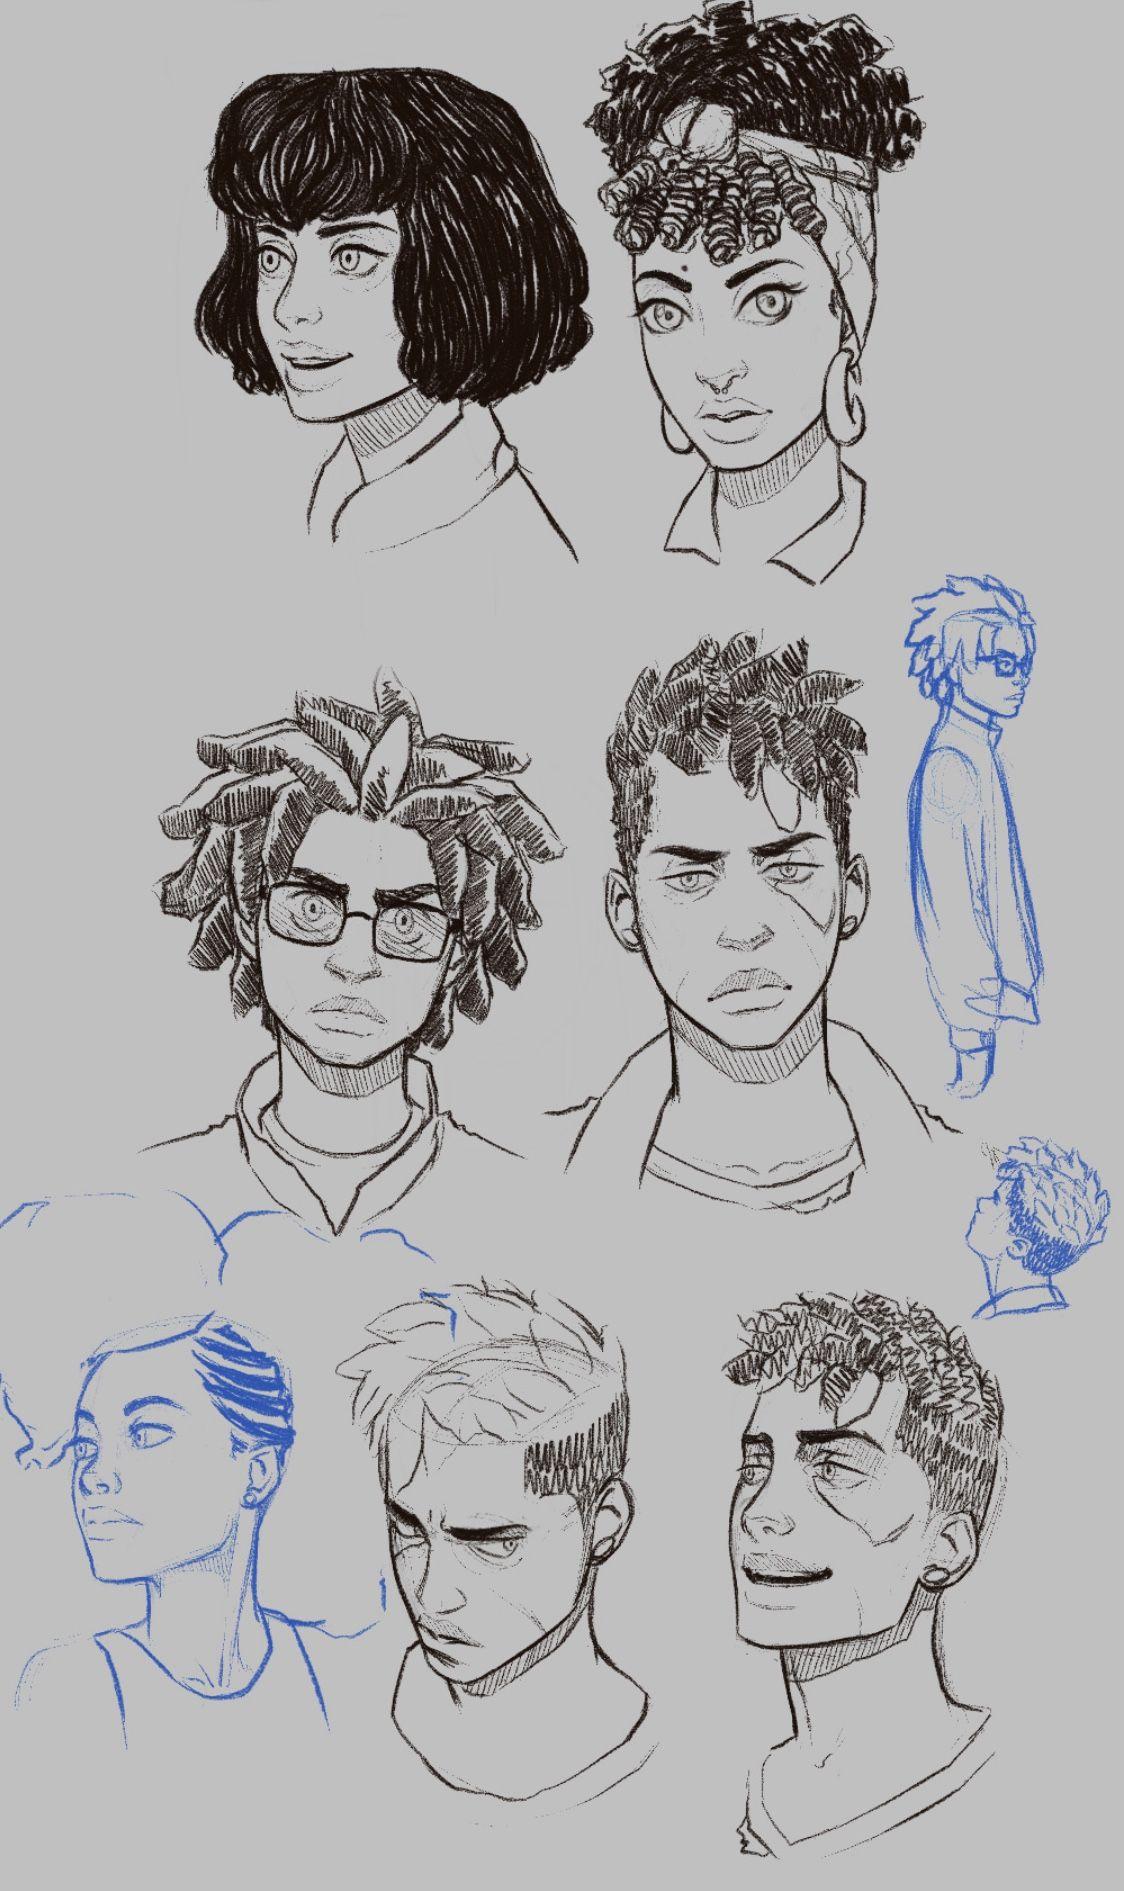 Black anime characters image by arrogant ambassador on